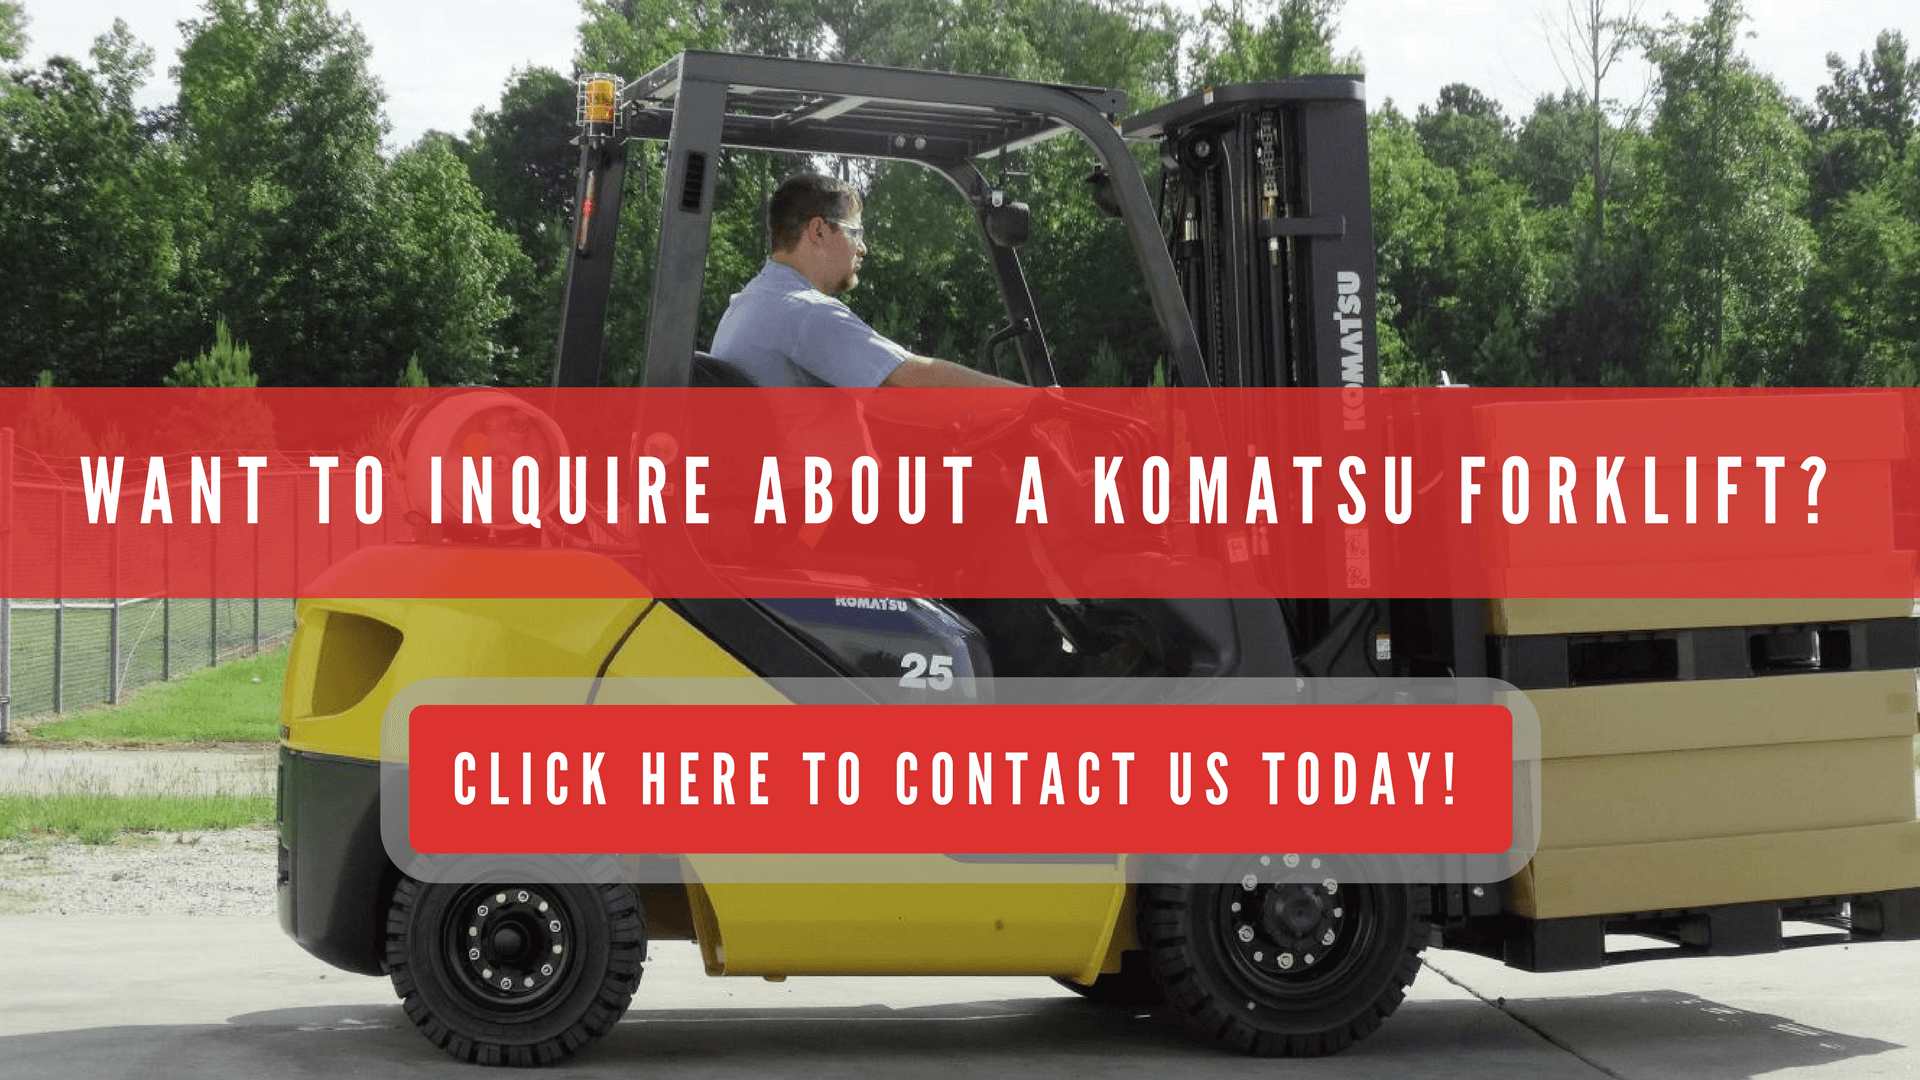 Wayco-Forklift-Training-Hero-Komatsu-1.png